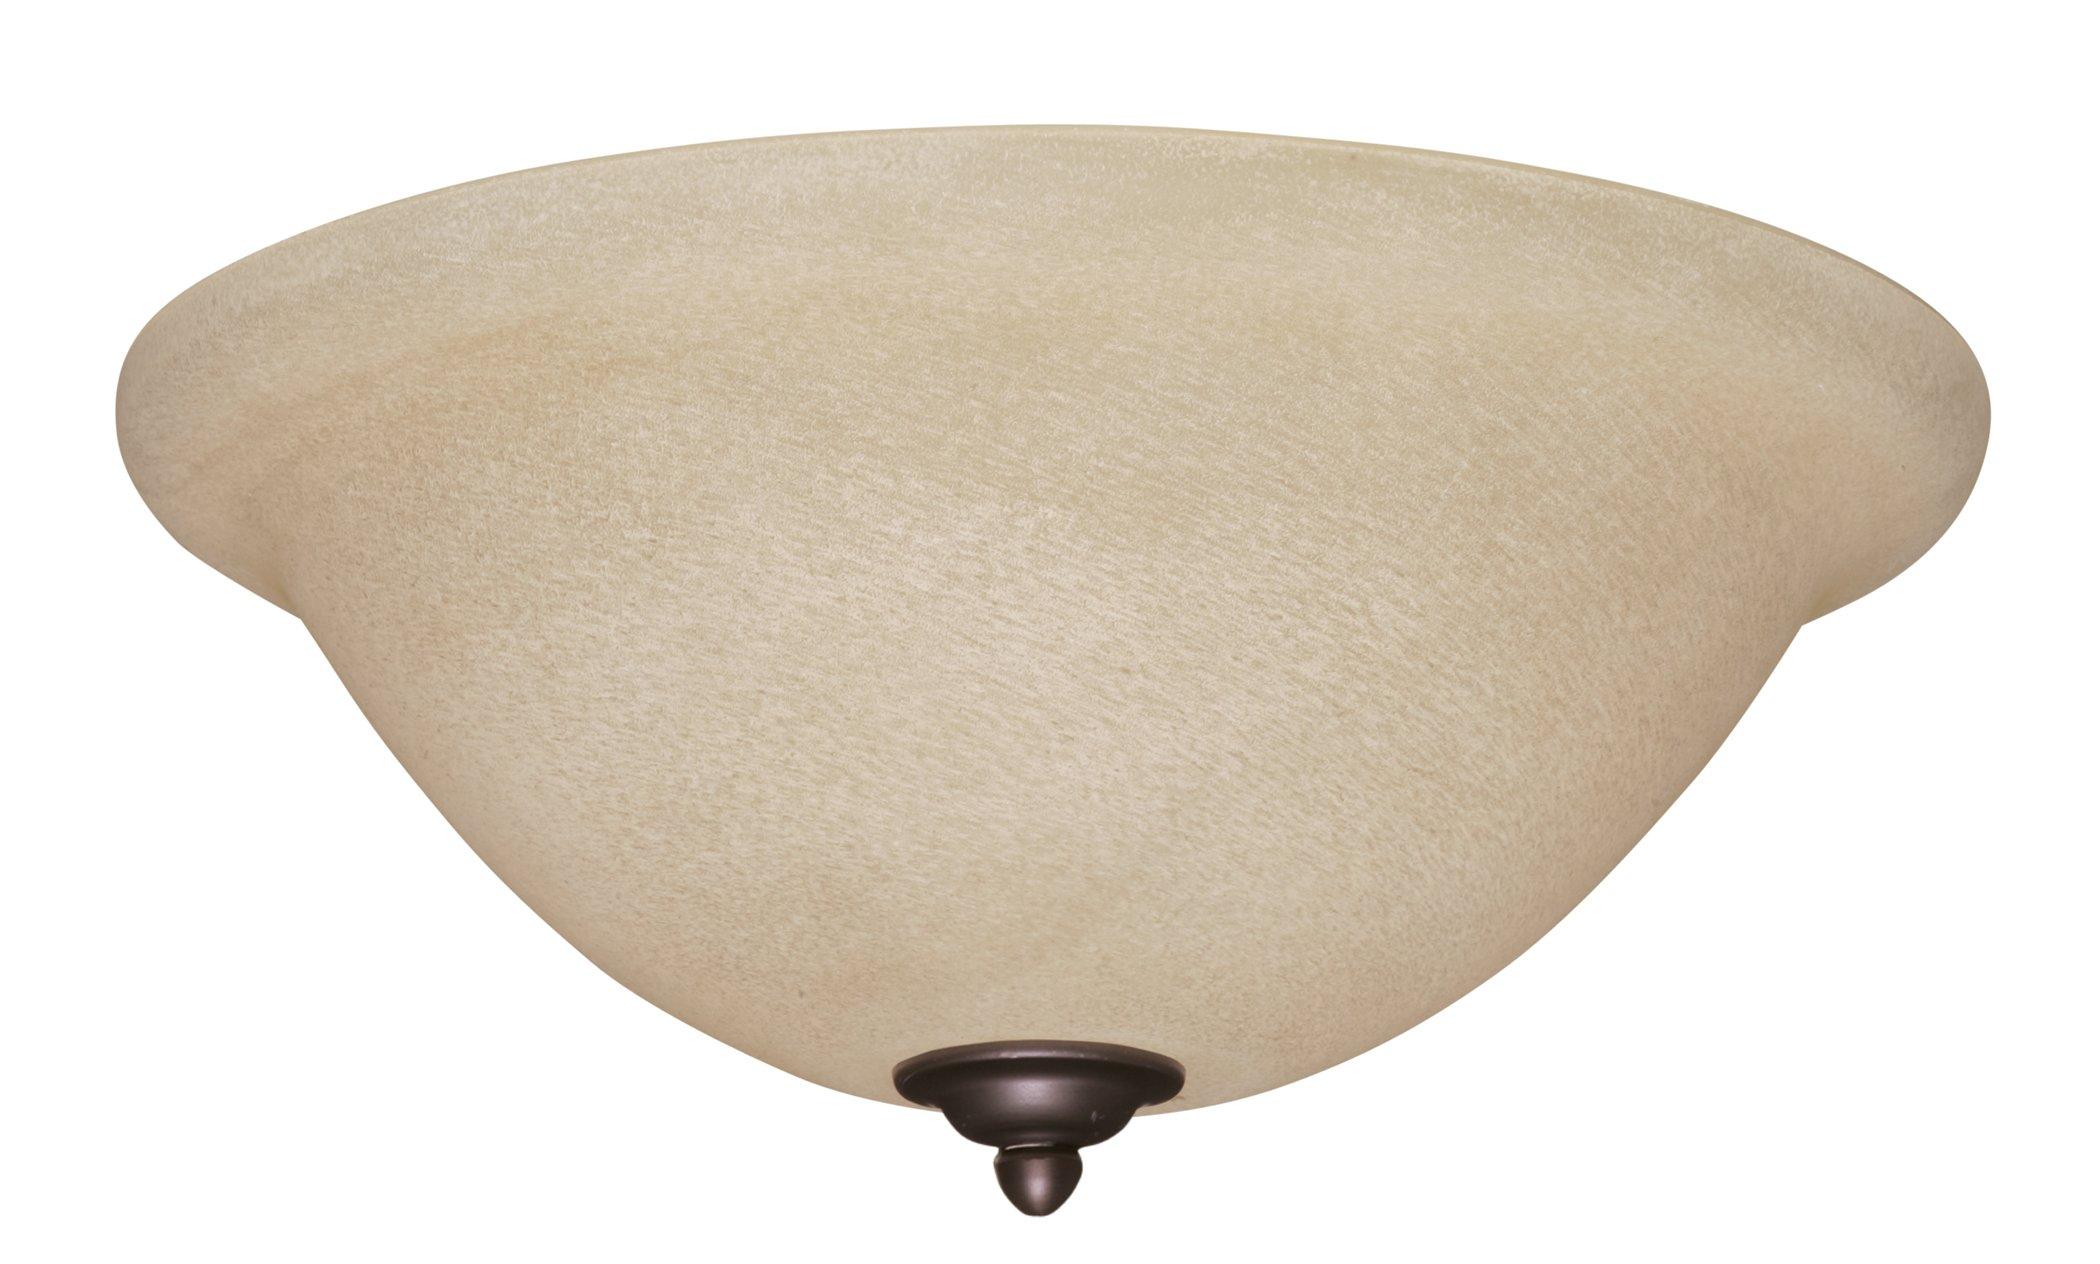 Emerson Ceiling Fans LK70VNB Amber Mist Light Fixture for Ceiling Fans, Medium Base CFL